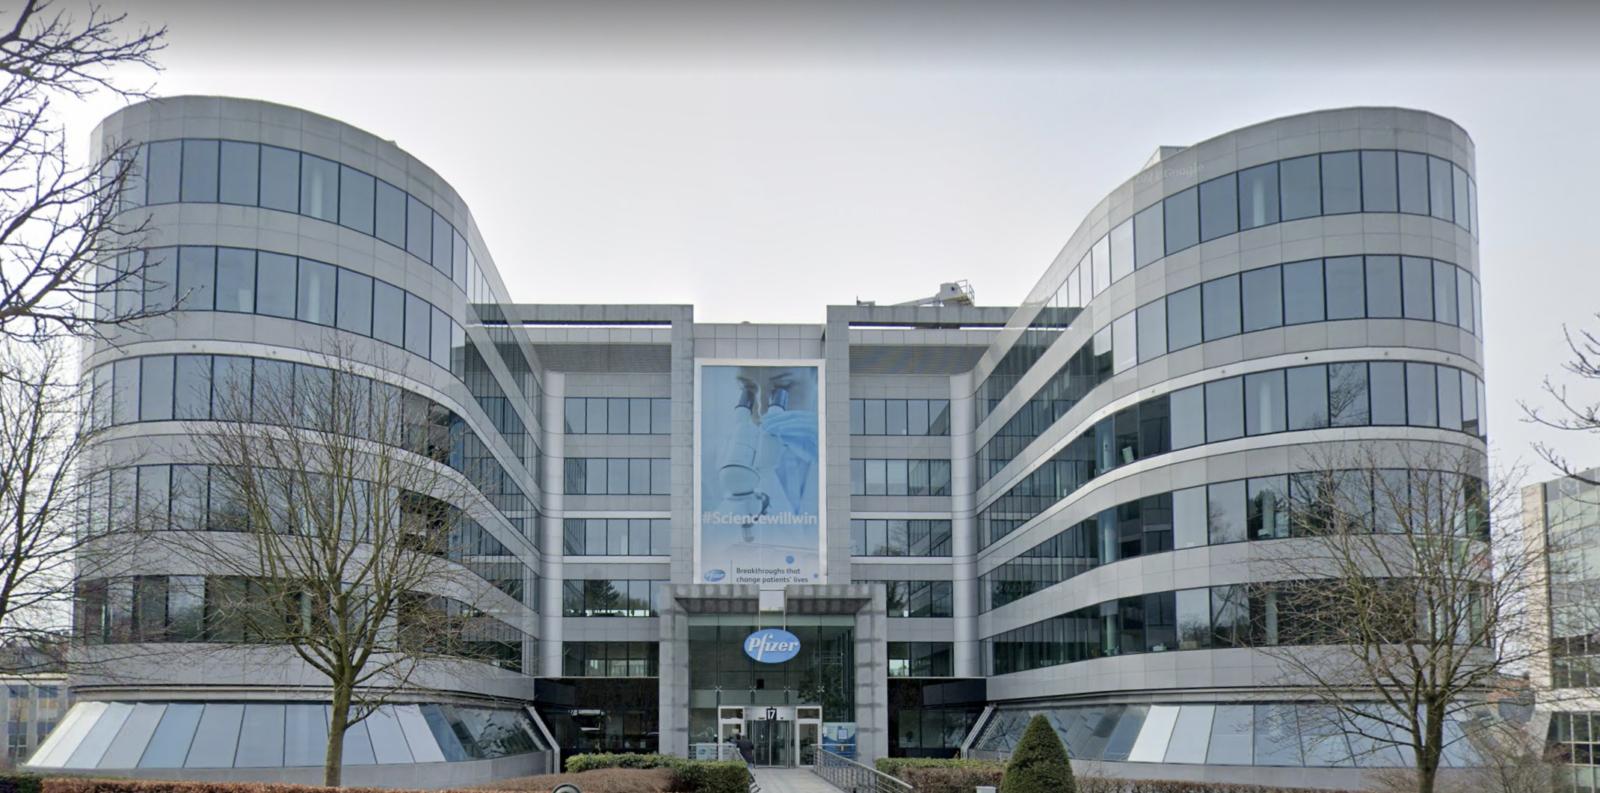 Pfizer Brussel REI Projects Brandwerende beplating